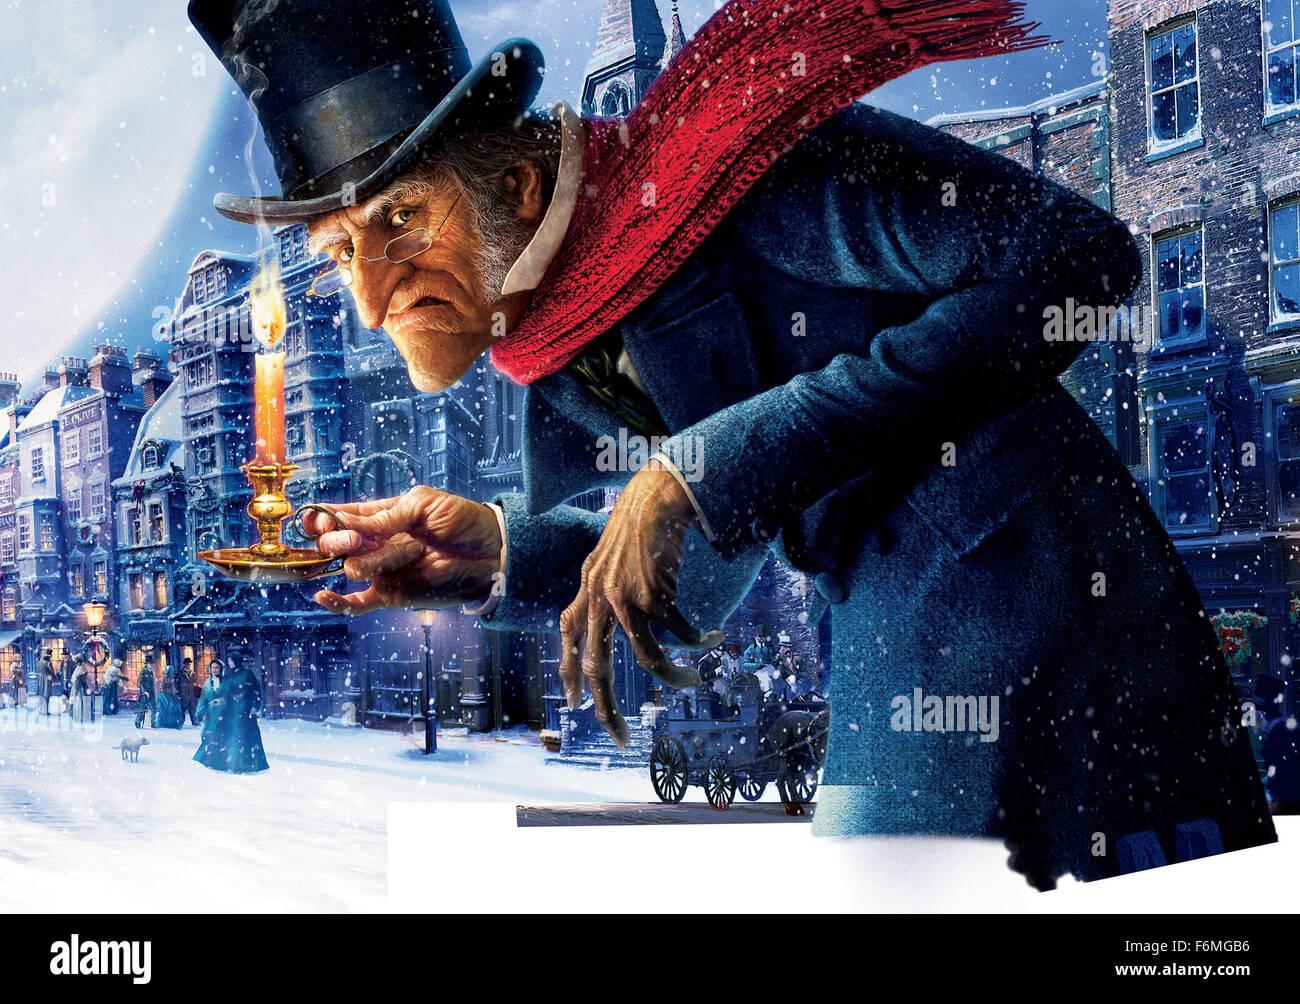 Erscheinungsdatum: 6. November 2009. FILMTITEL: A Christmas Carol ...